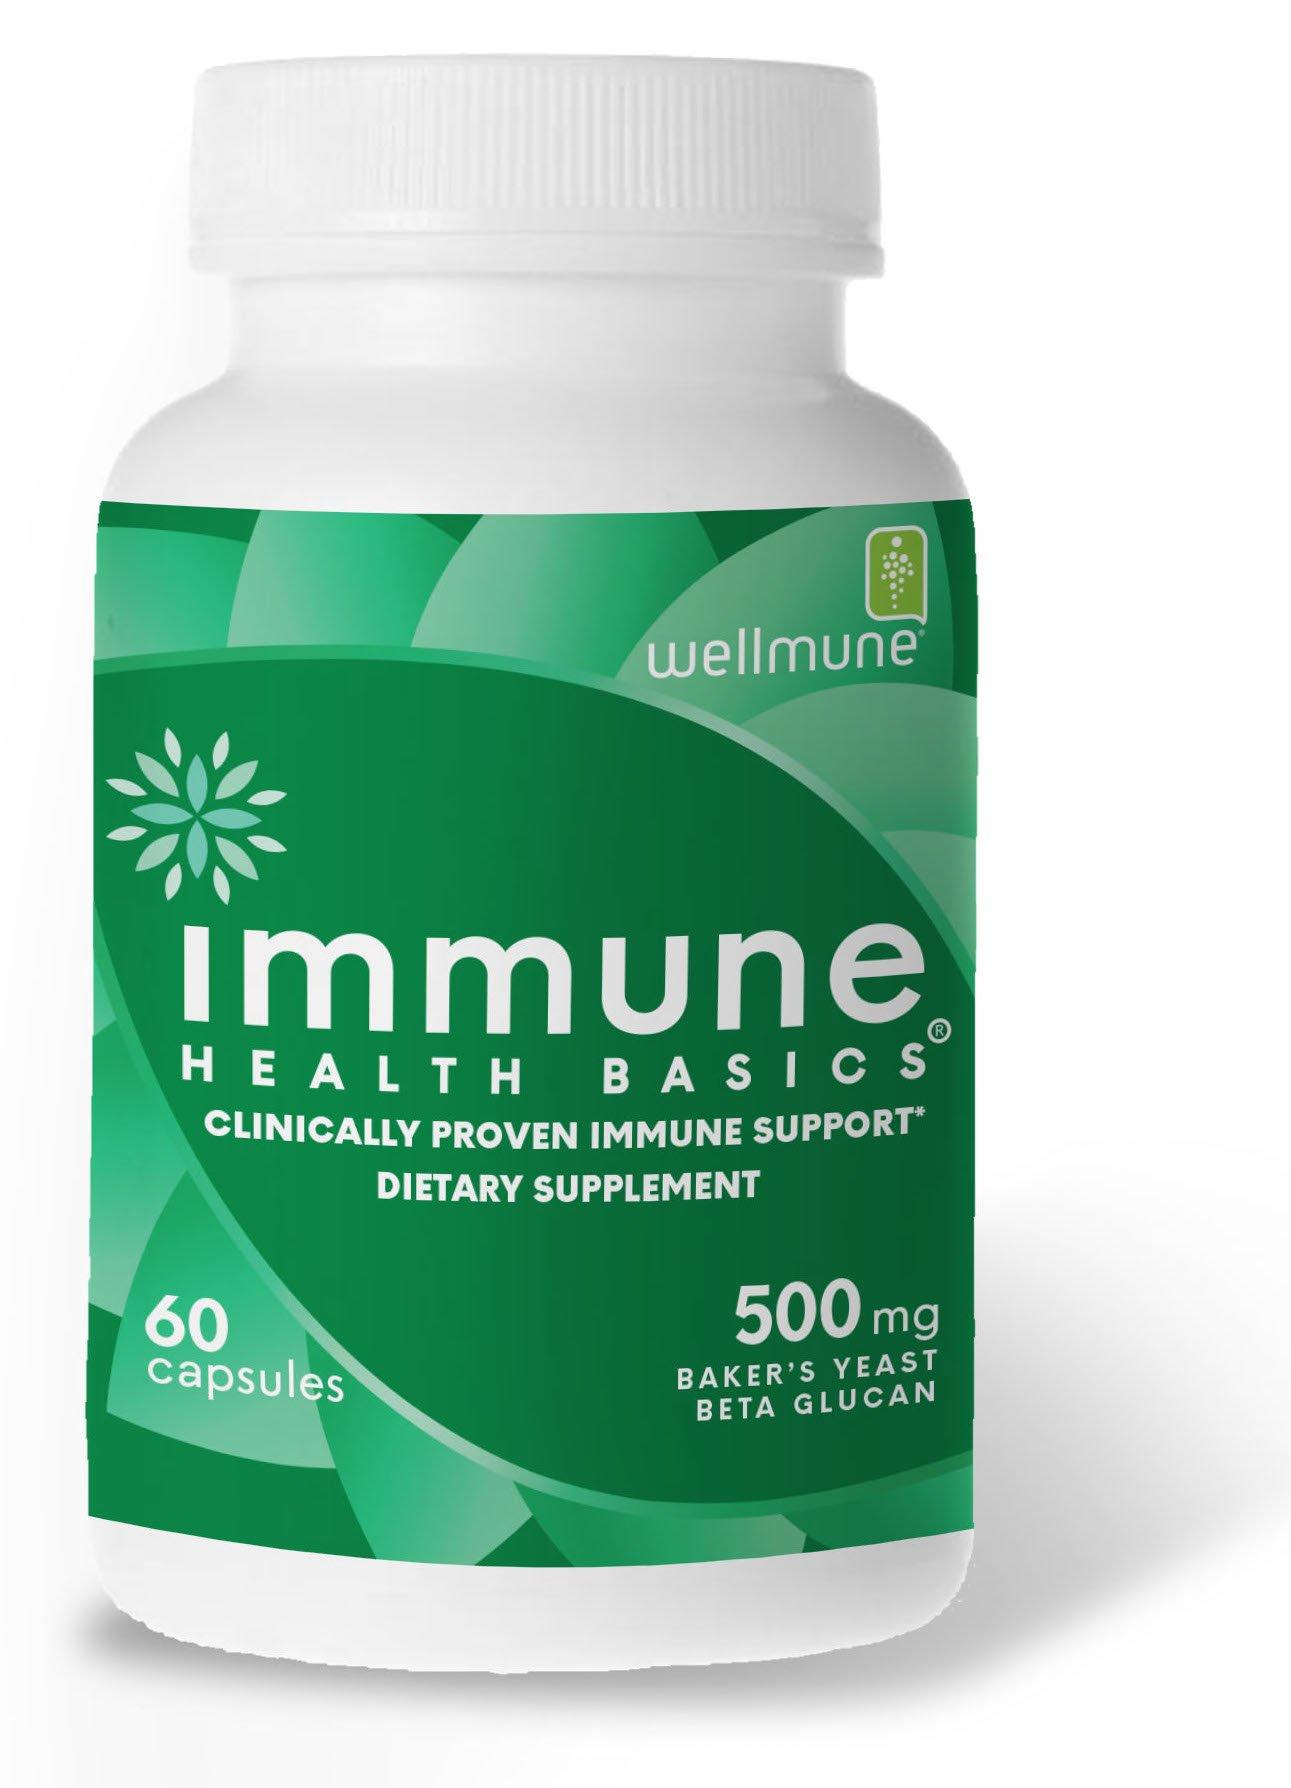 Immune Health Basics - Wellmune Beta glucan 500 mg Immune Support, 60 Veg Capsules